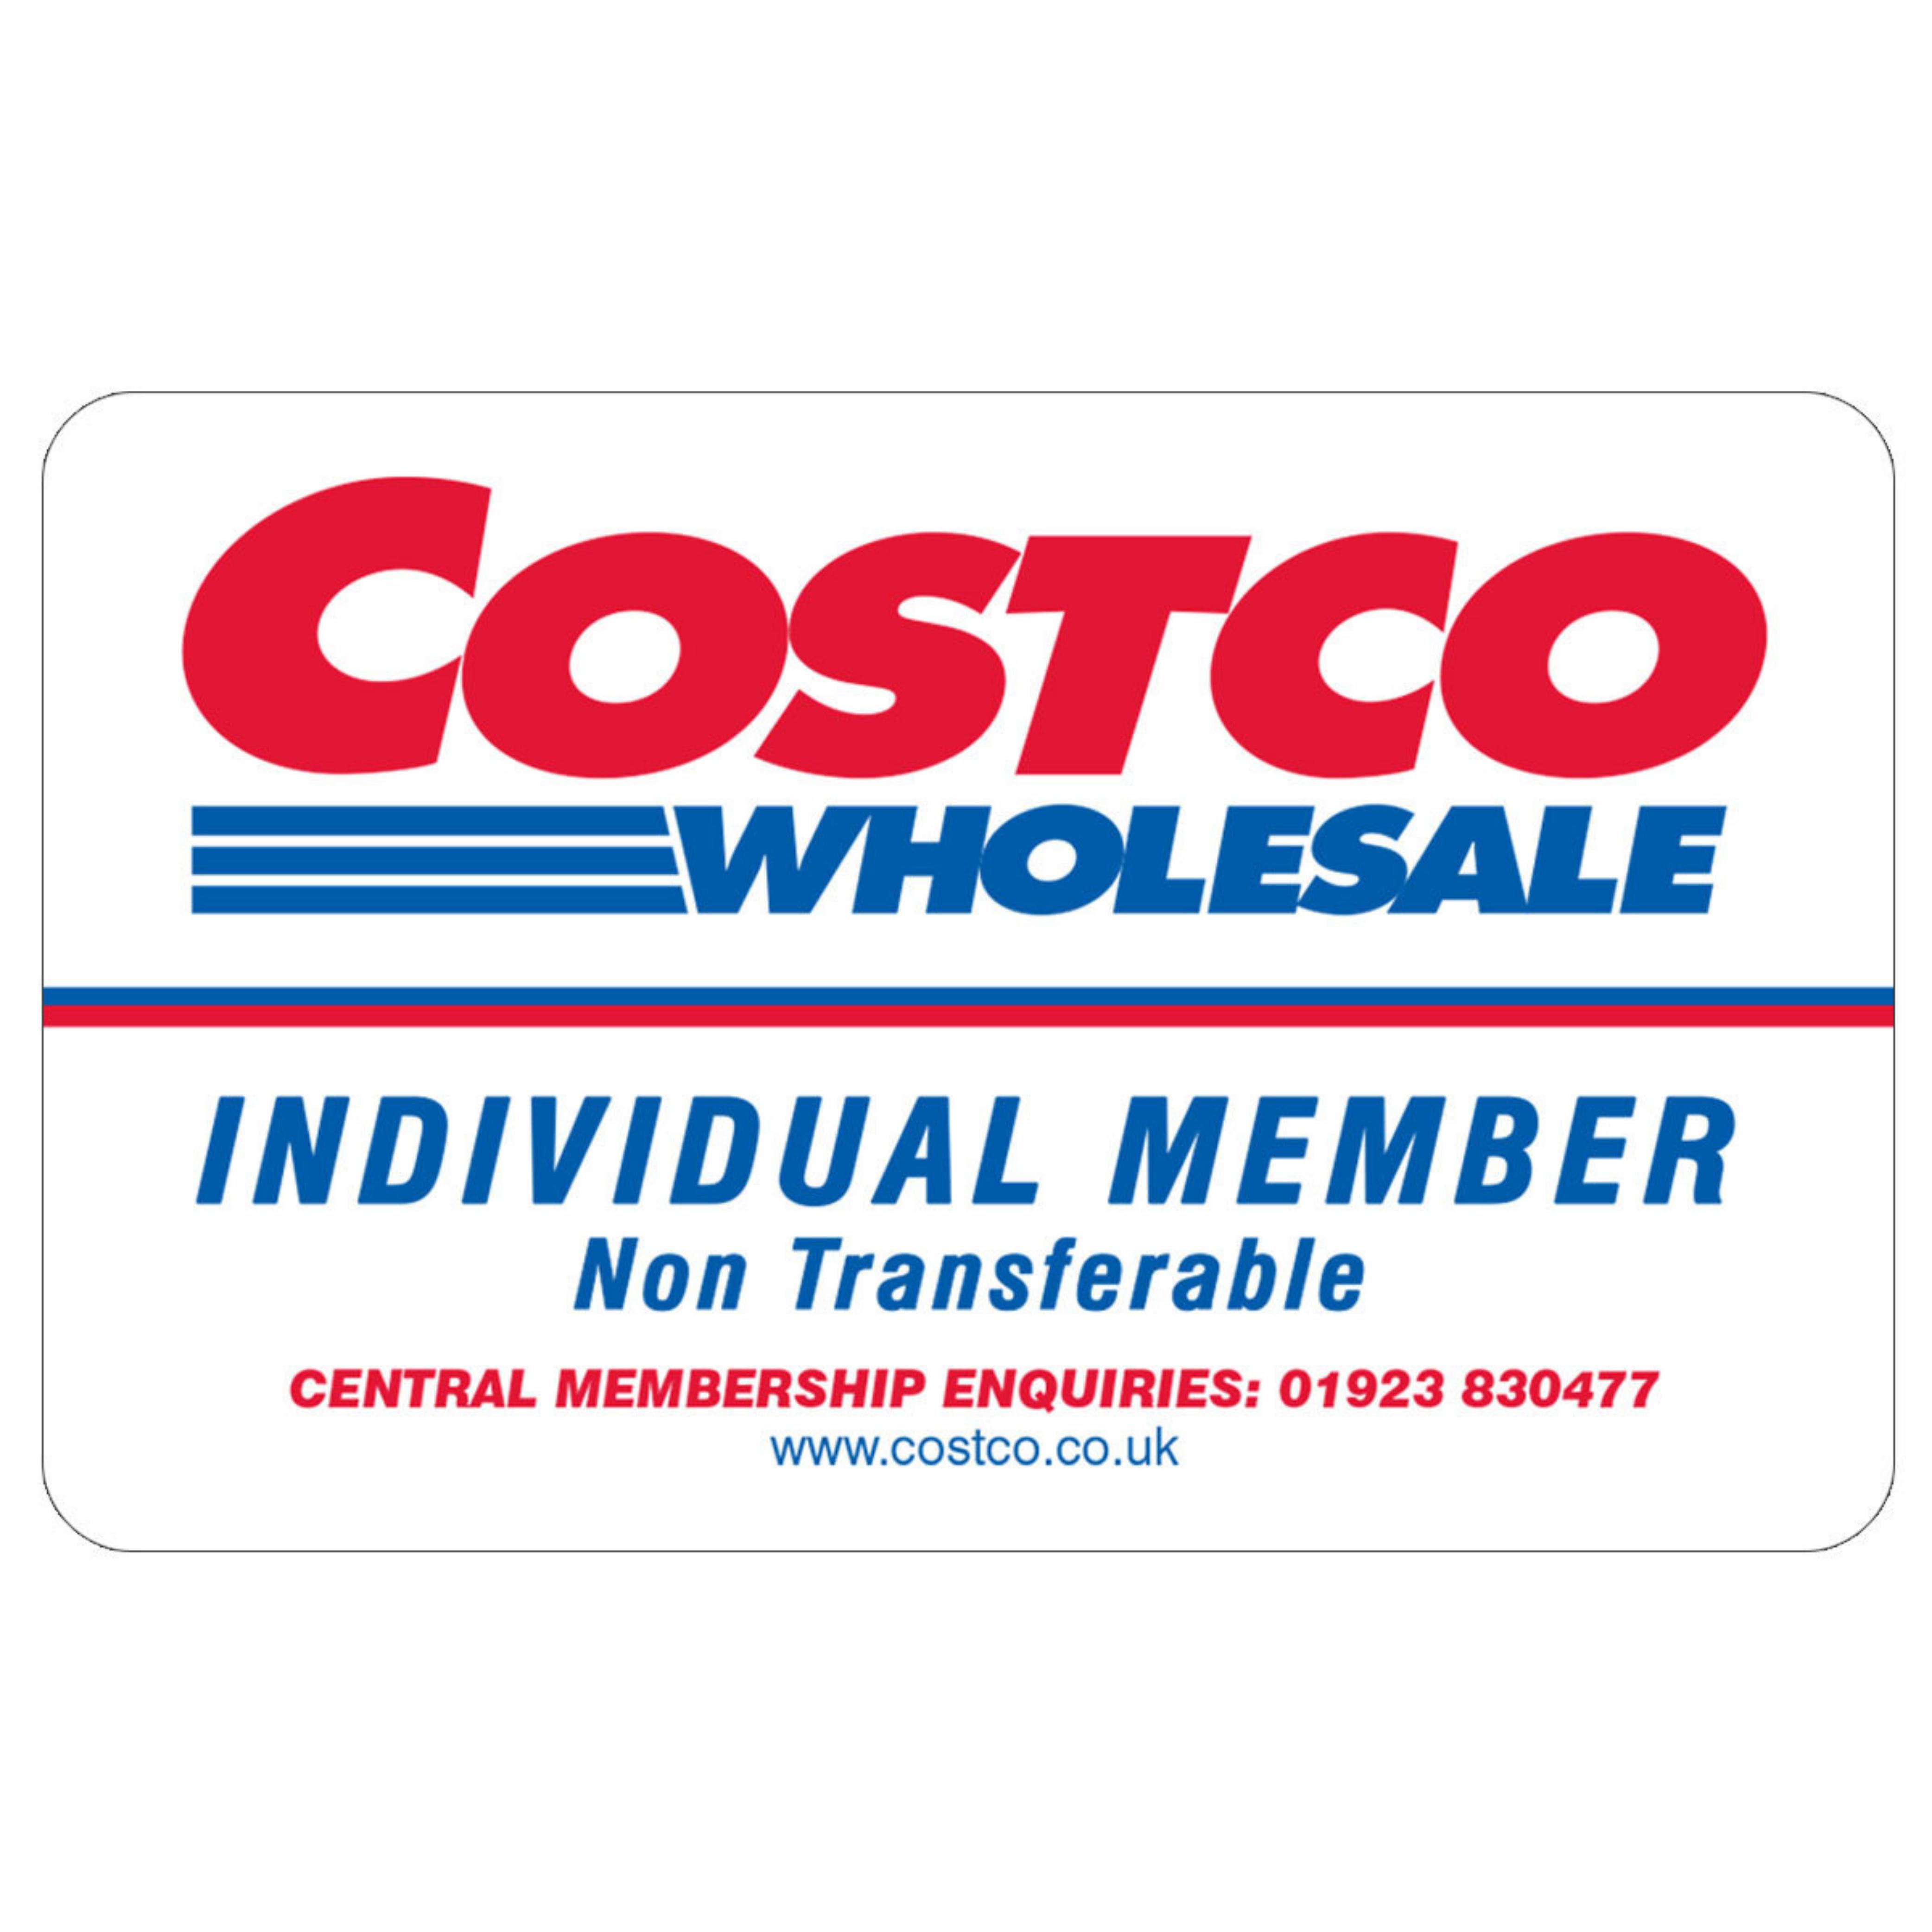 Costco (UK) Wholesale Ltd